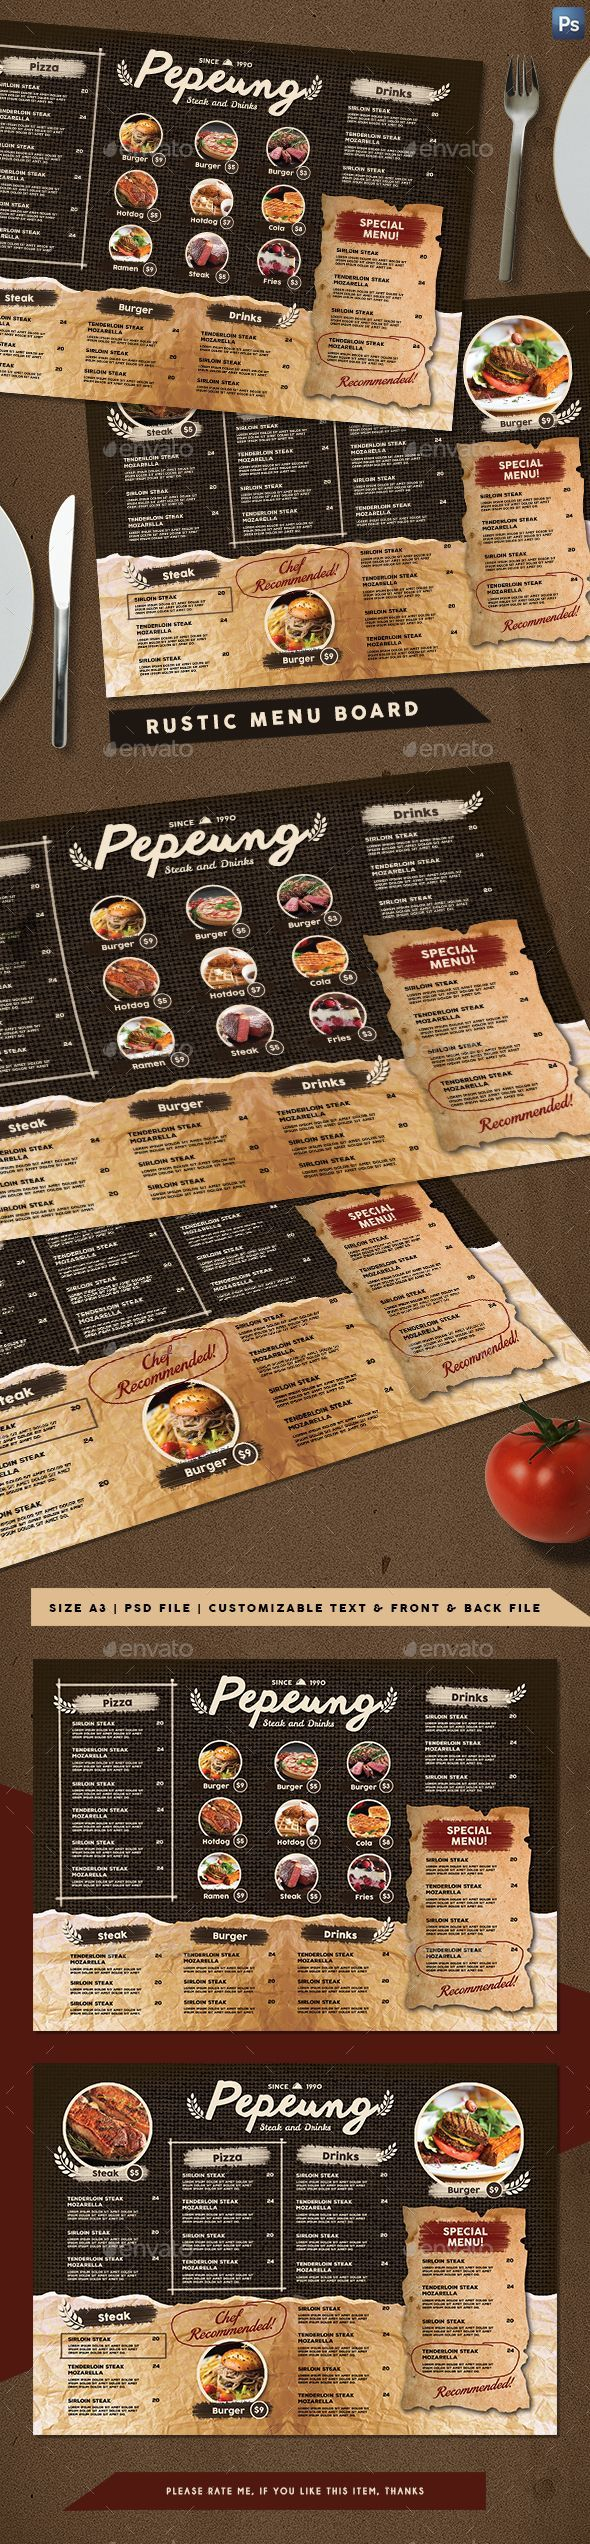 best 25 steak house menu ideas on pinterest new york steak